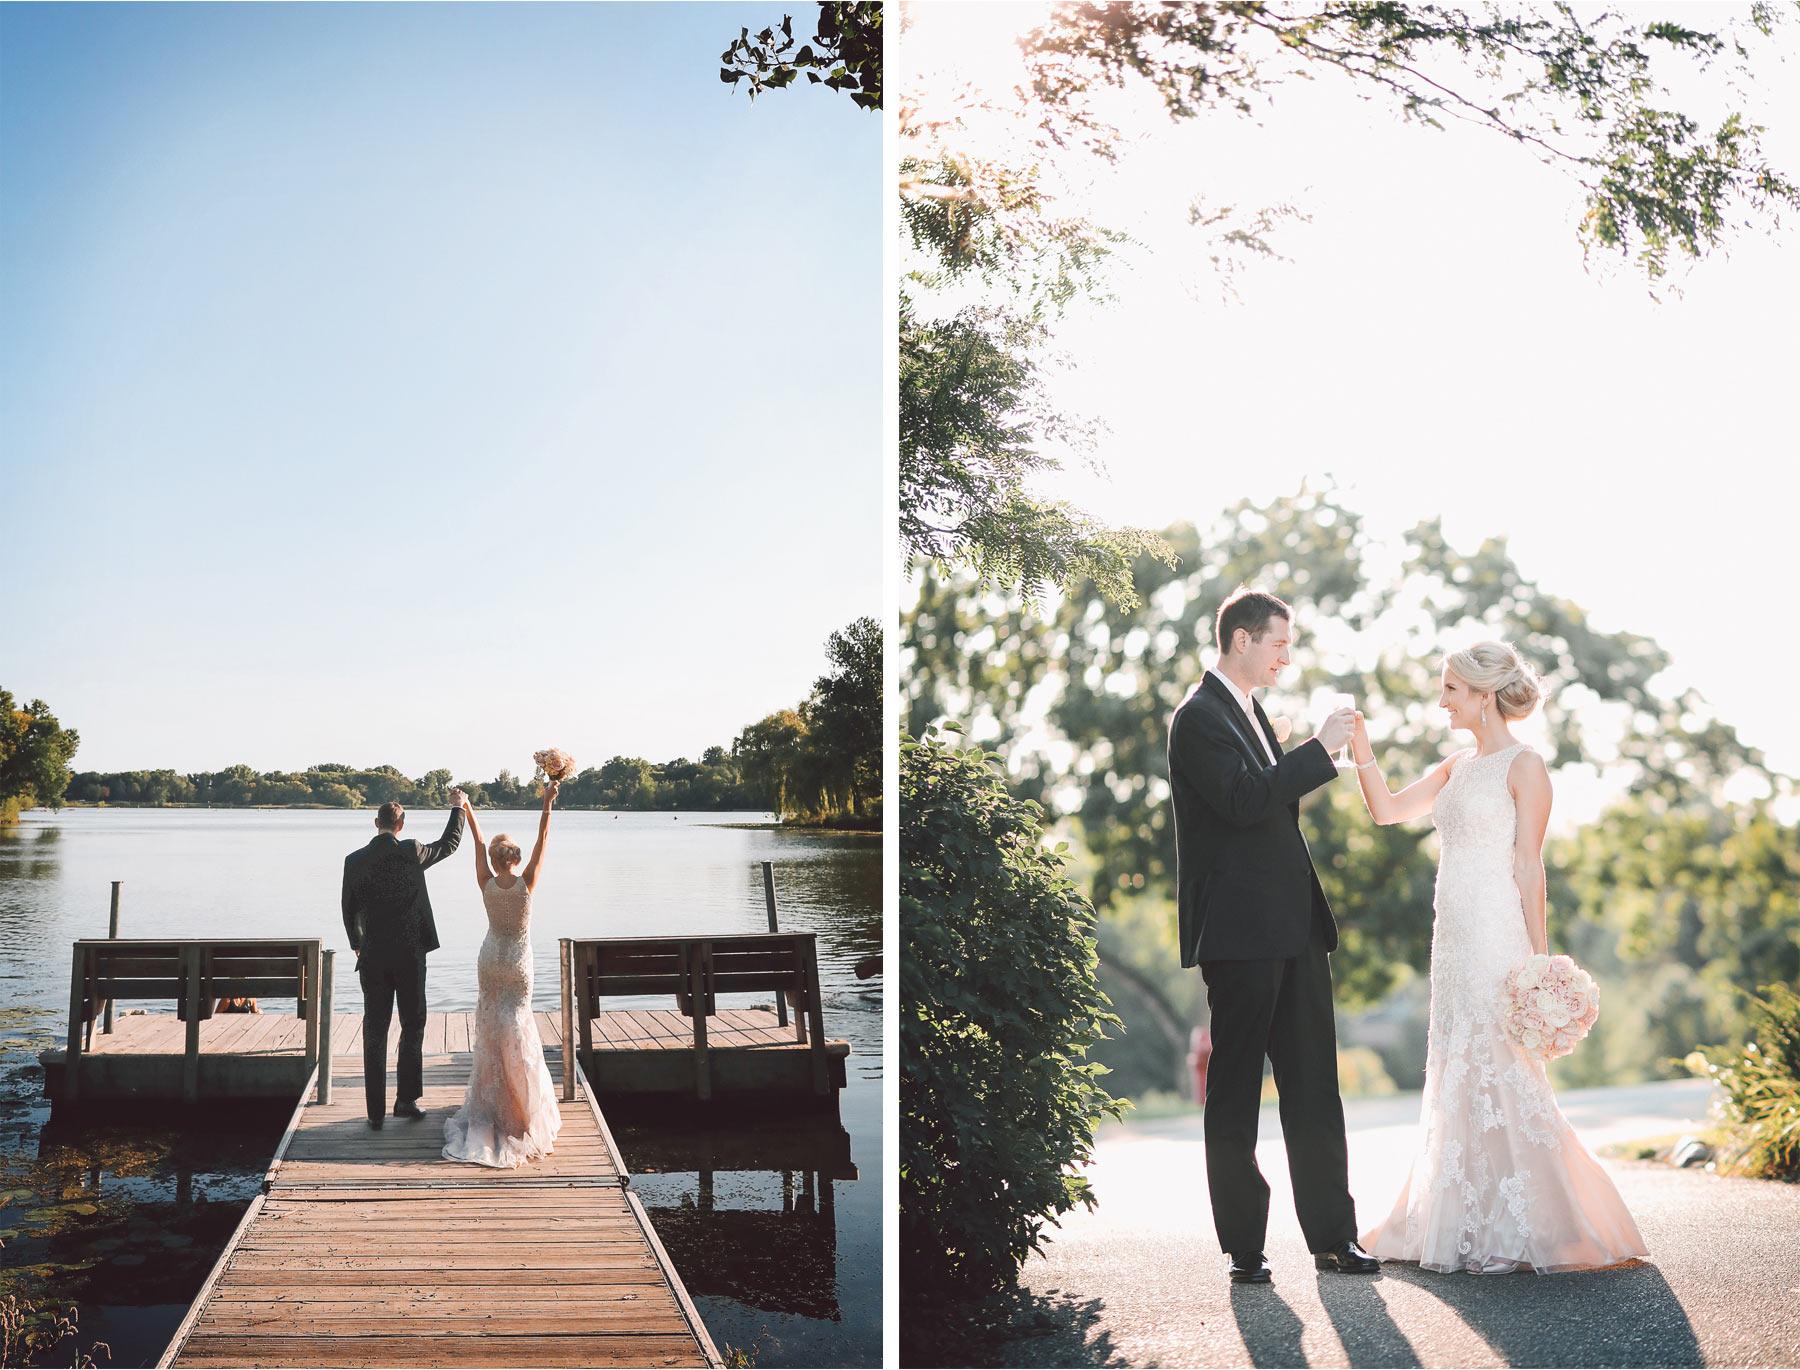 17-Minneapolis-Minnesota-Wedding-Photography-by-Vick-Photography-Lake-of-the-Isles-Jenna-and-Josh.jpg